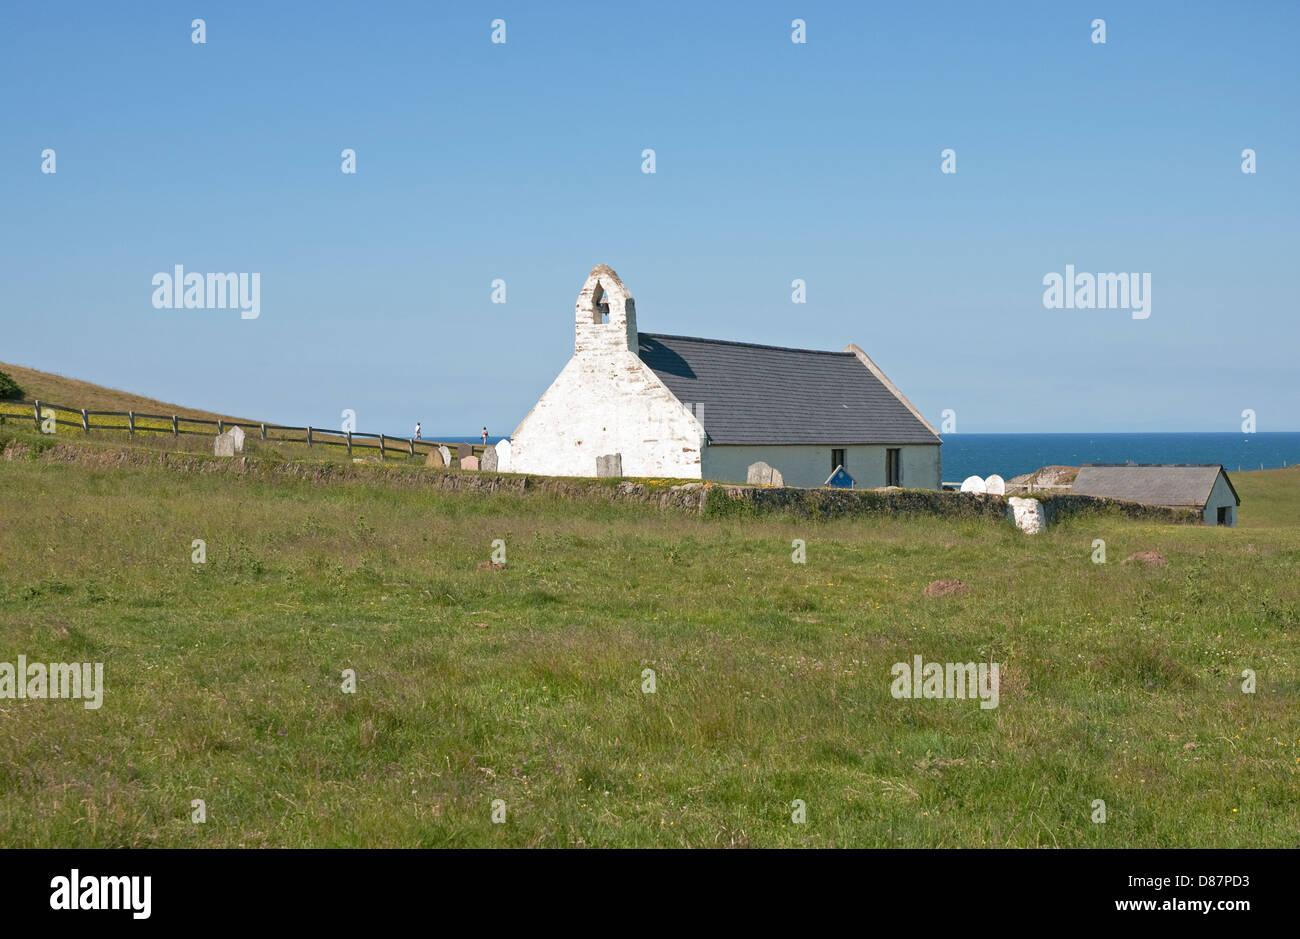 The isolated 14th century Holy Cross Church on the coast at Mwnt near Cardigan, Ceredigion, west Wales, United Kingdom Stock Photo